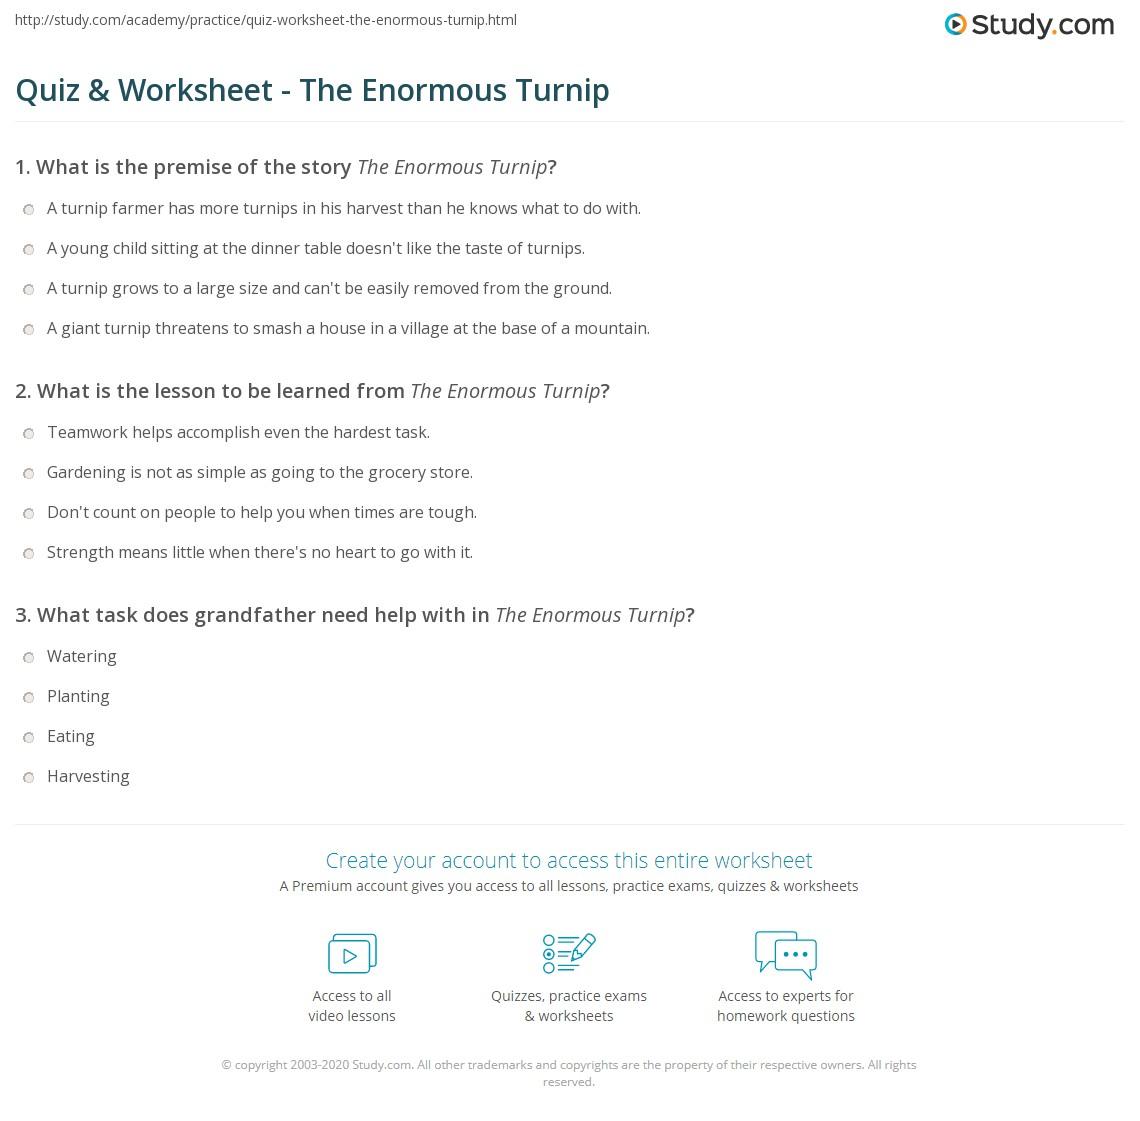 Workbooks the enormous turnip worksheets : Quiz & Worksheet - The Enormous Turnip | Study.com